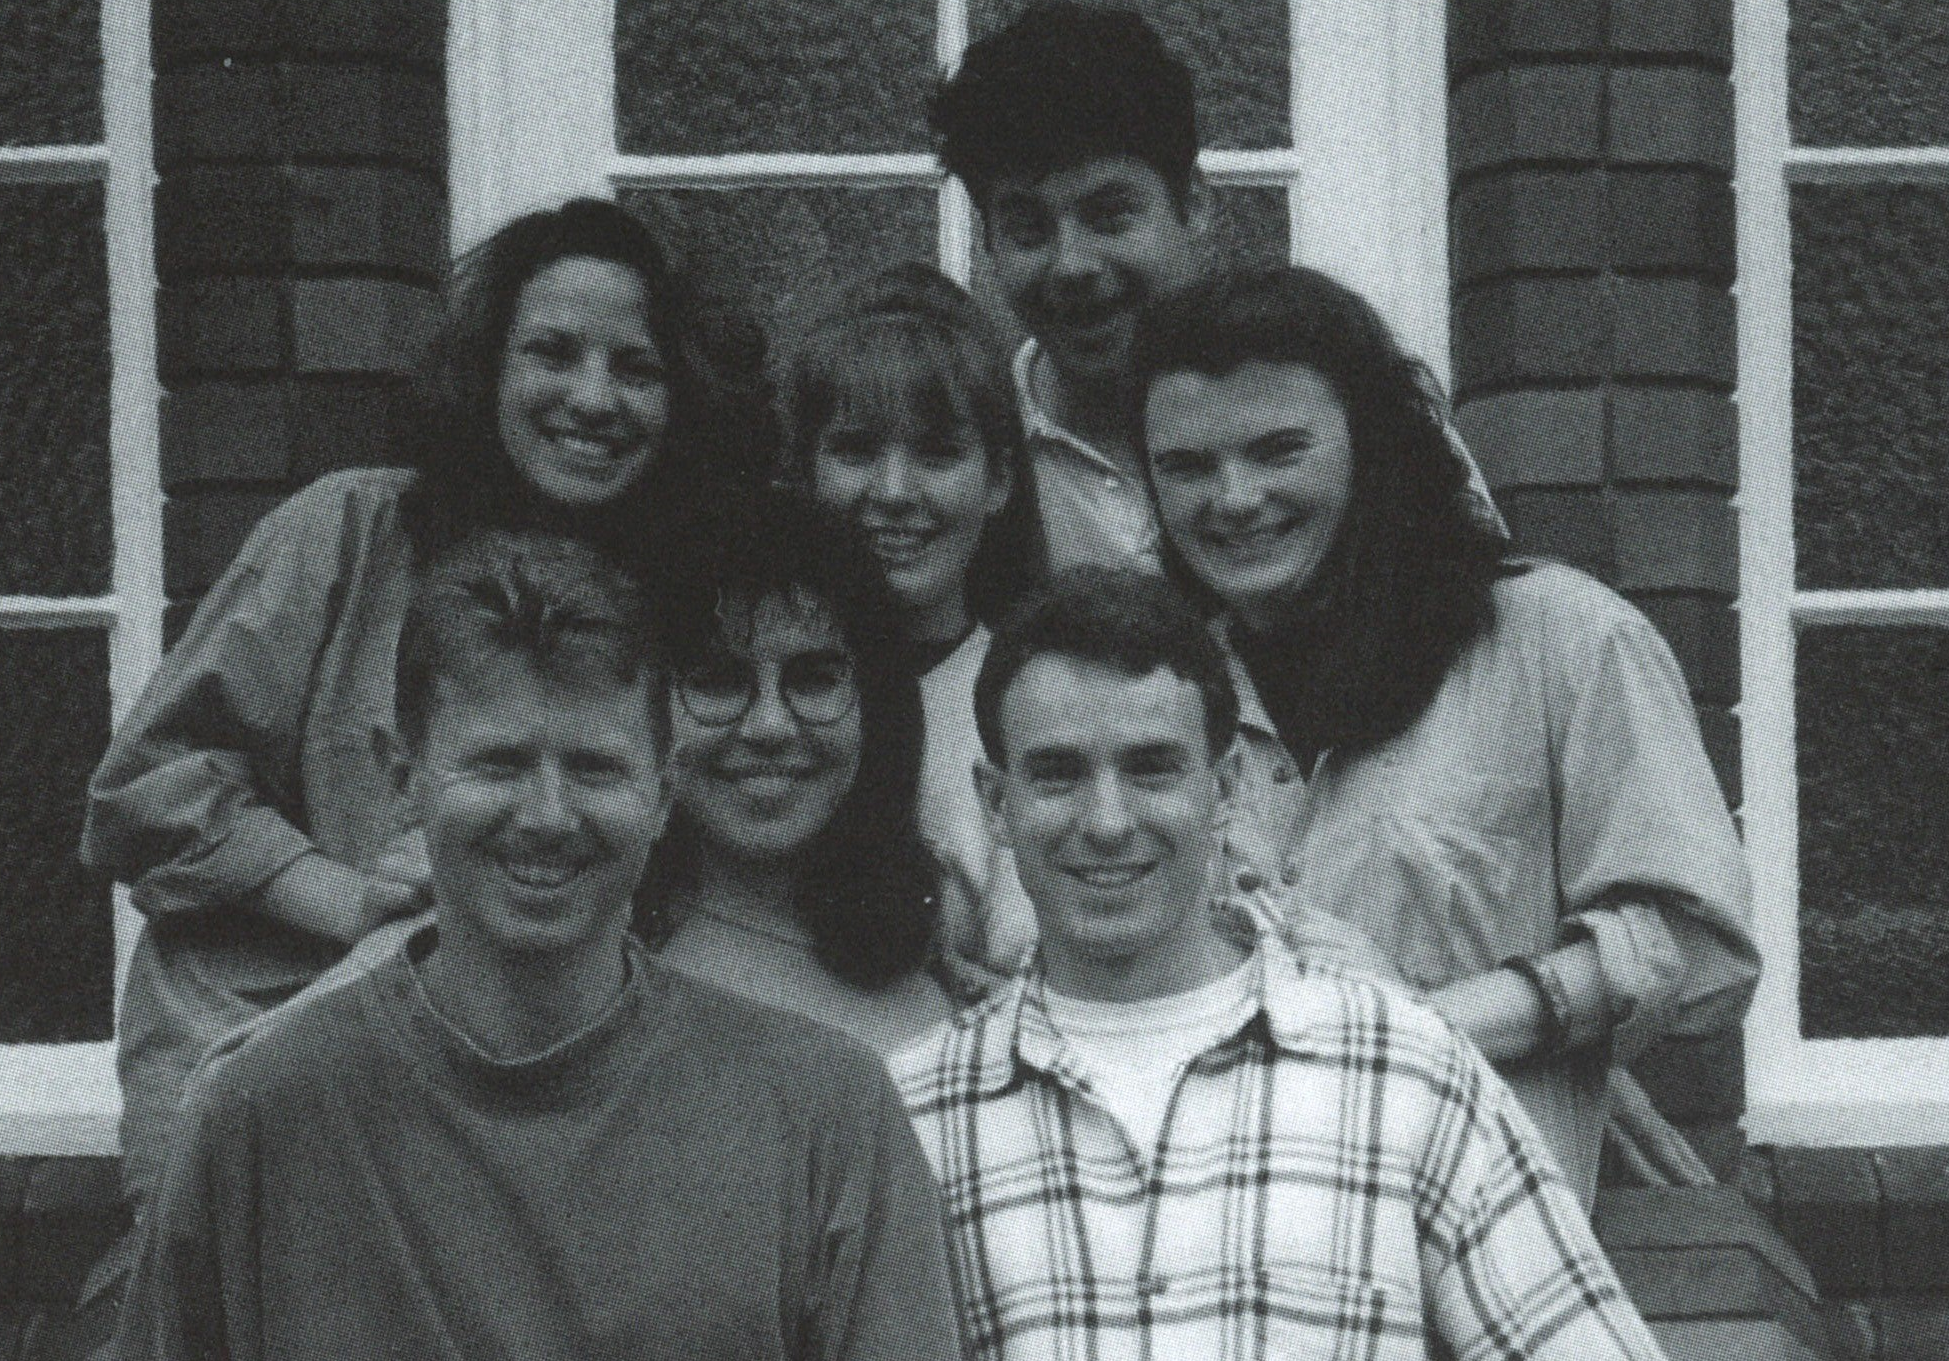 Back Row: Audrey Dean, Henrietta Brennan nee Harris, Matthew Brookes, Carla Brookes nee Whitelock Front Row: Simon Nye, Selina Hasham, Steve Toohey (National Director/Team Manager)